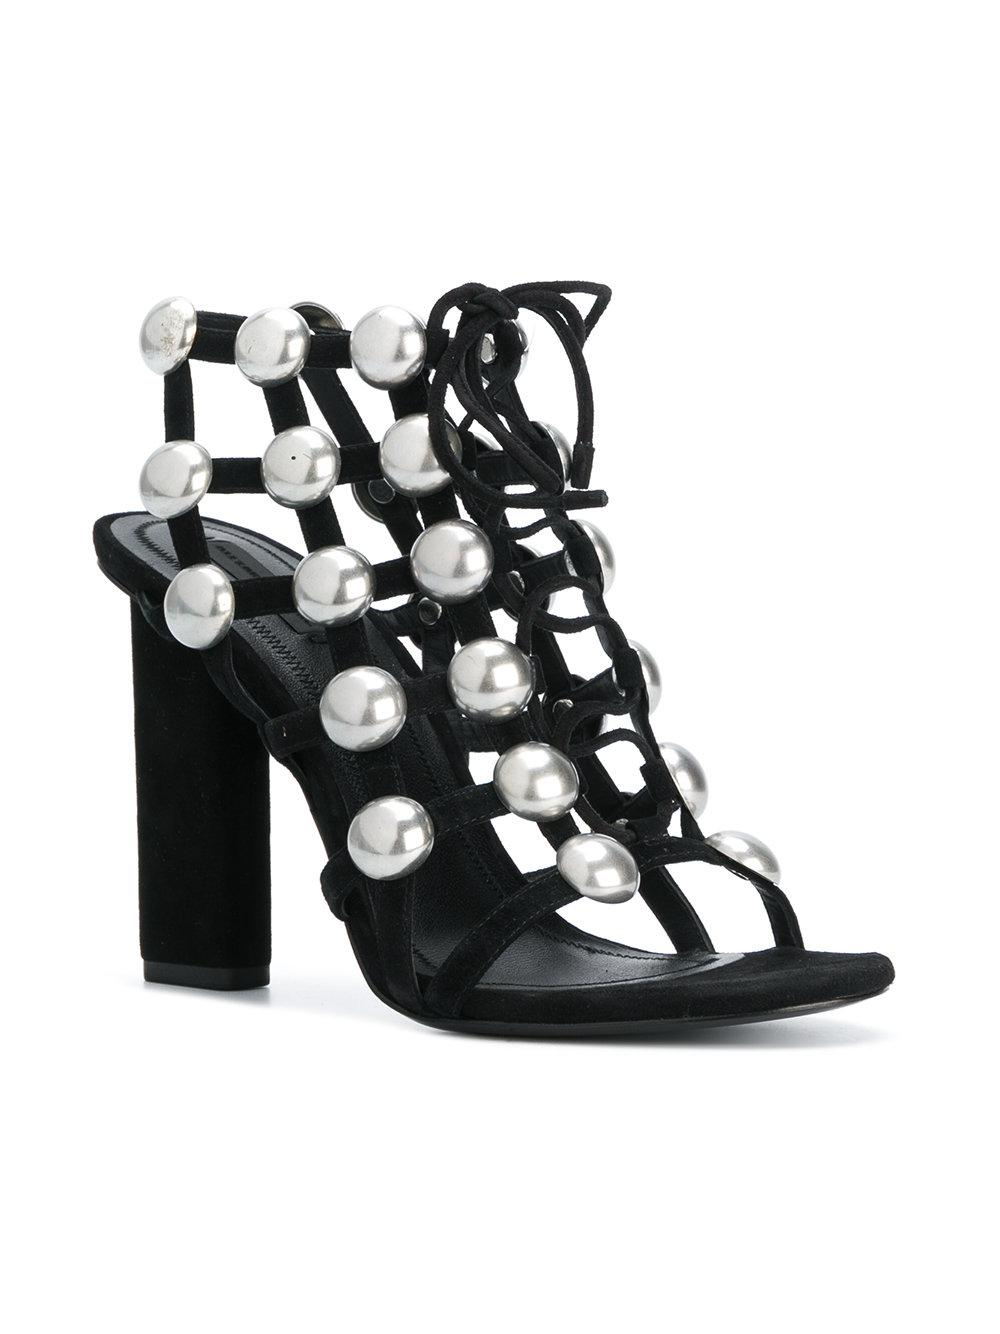 Rubie sandals - Black Alexander Wang fMDsznV2